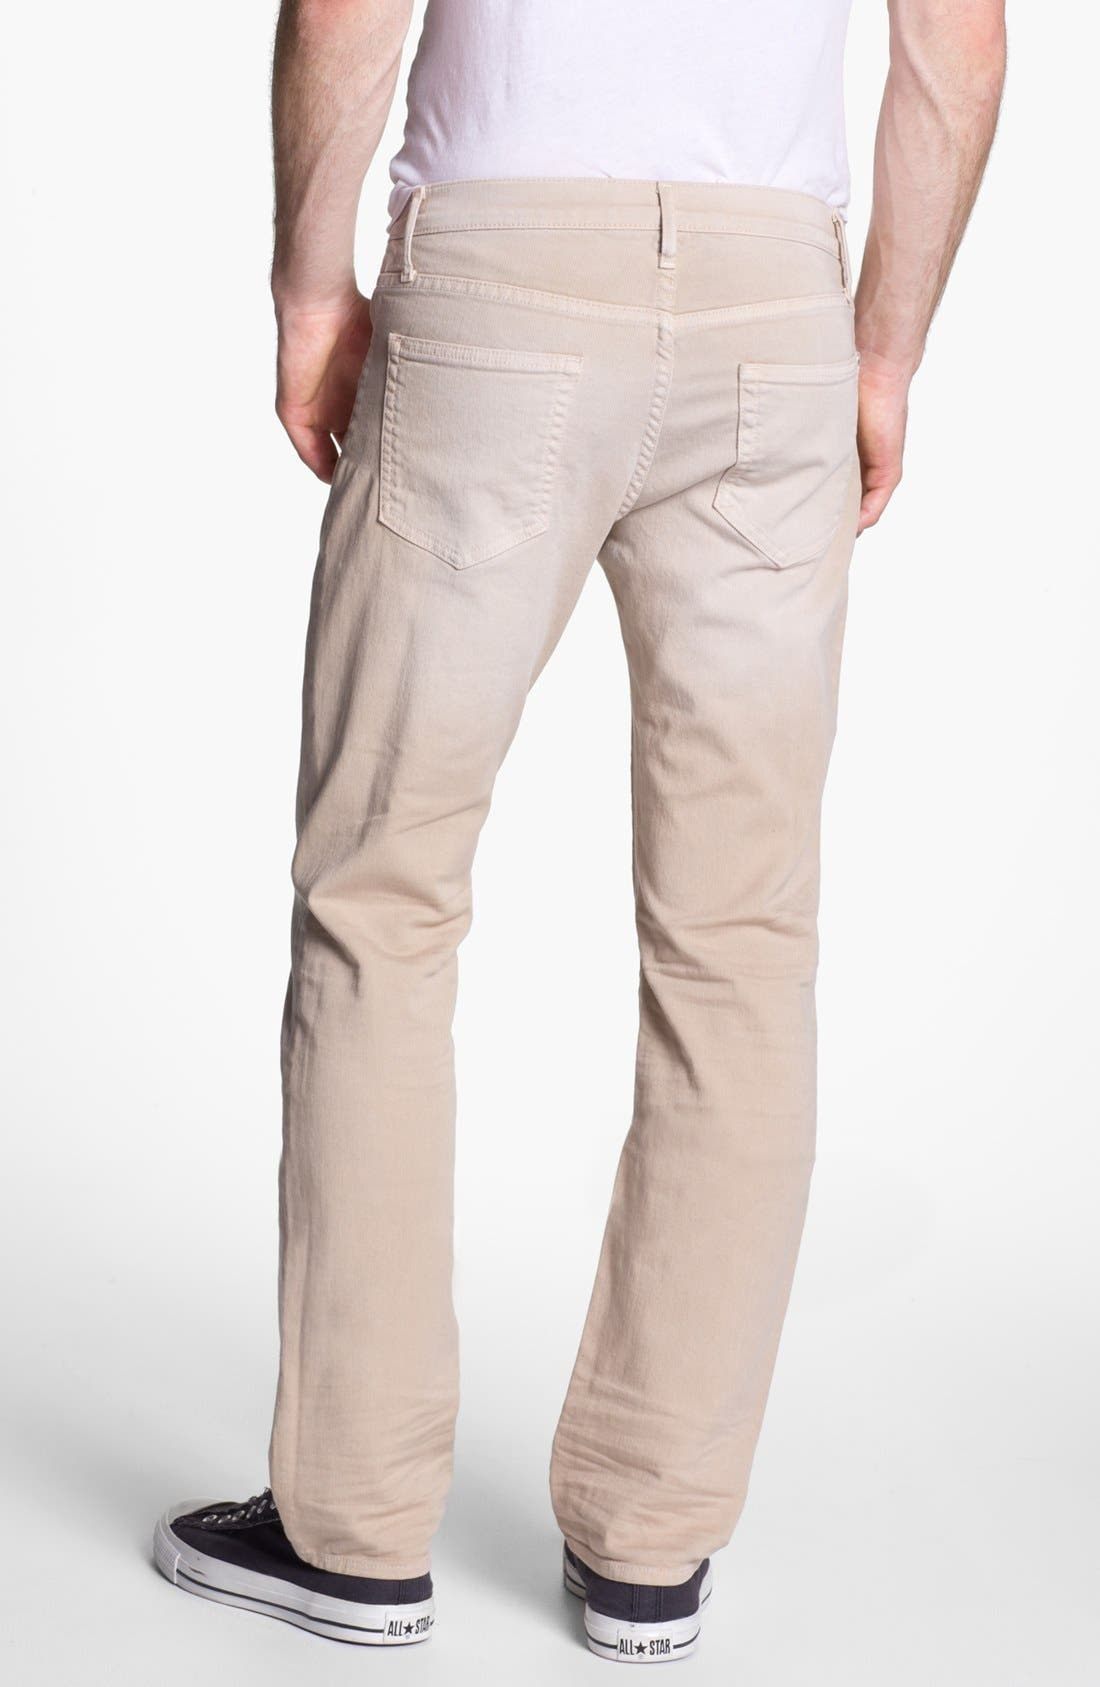 Alternate Image 1 Selected - Koral 'Los Angeles' Slim Leg Jeans (Tan)